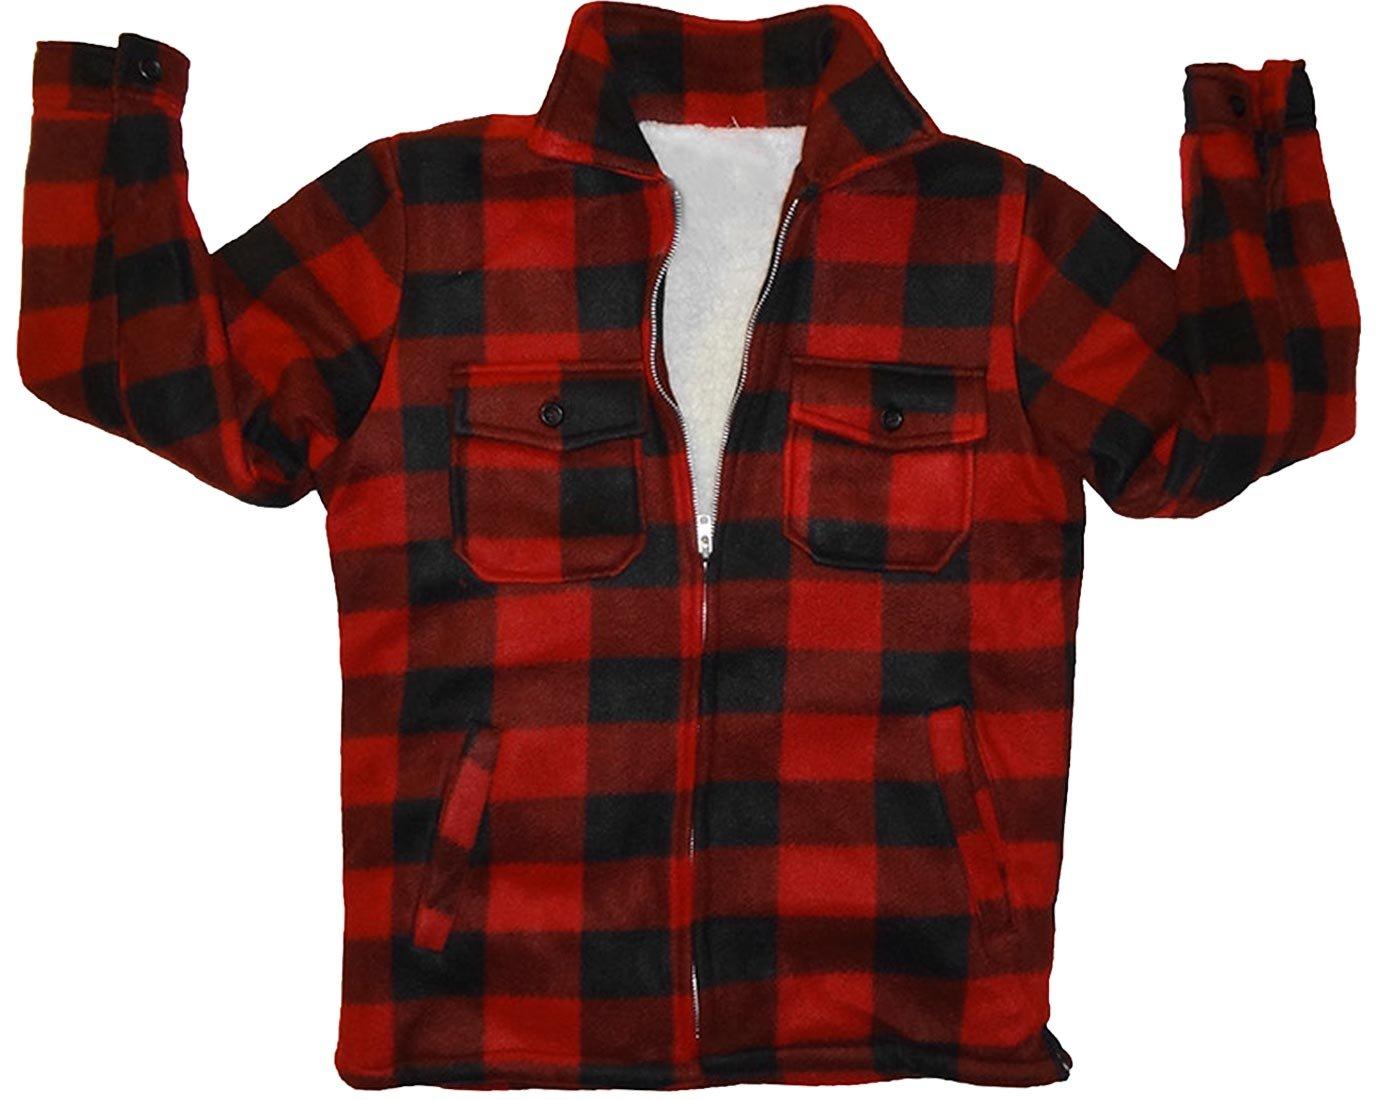 Woodland Supply Co. Boys' Fleece Sherpa Lined Buffalo Plaid Zip Up Jacket